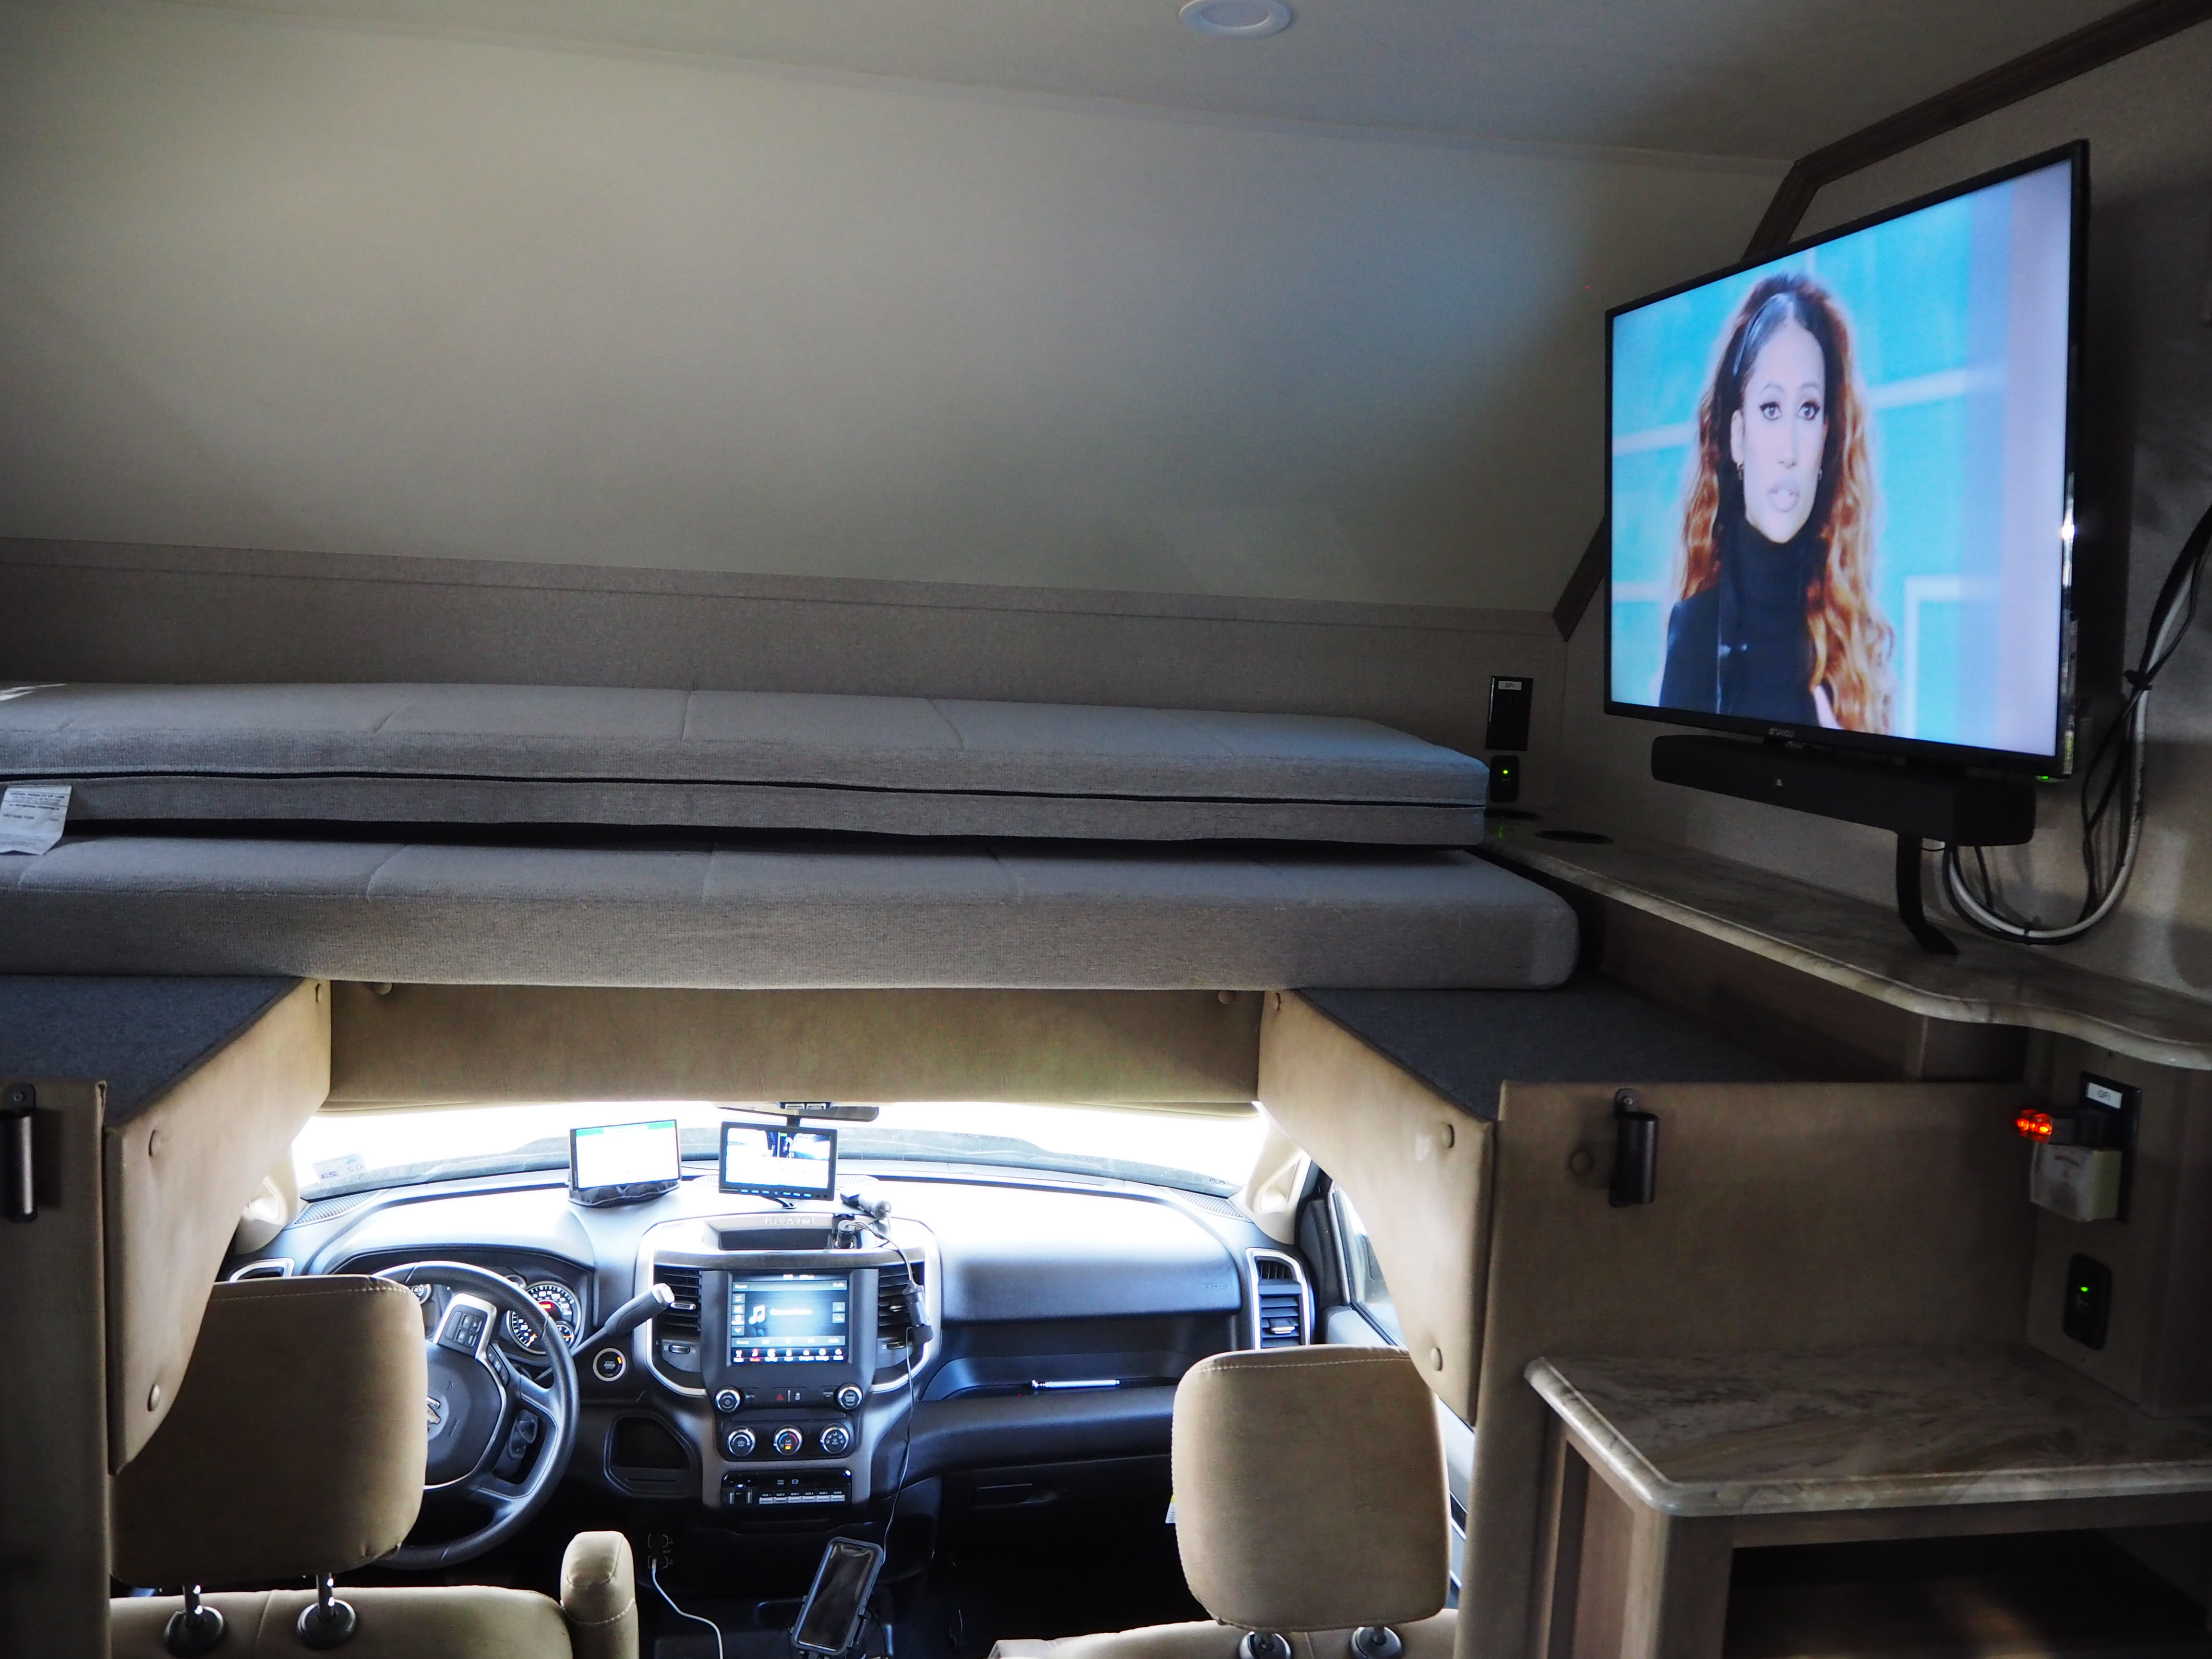 Note GPS and rear view camera. Dynamax Isata 5 2021